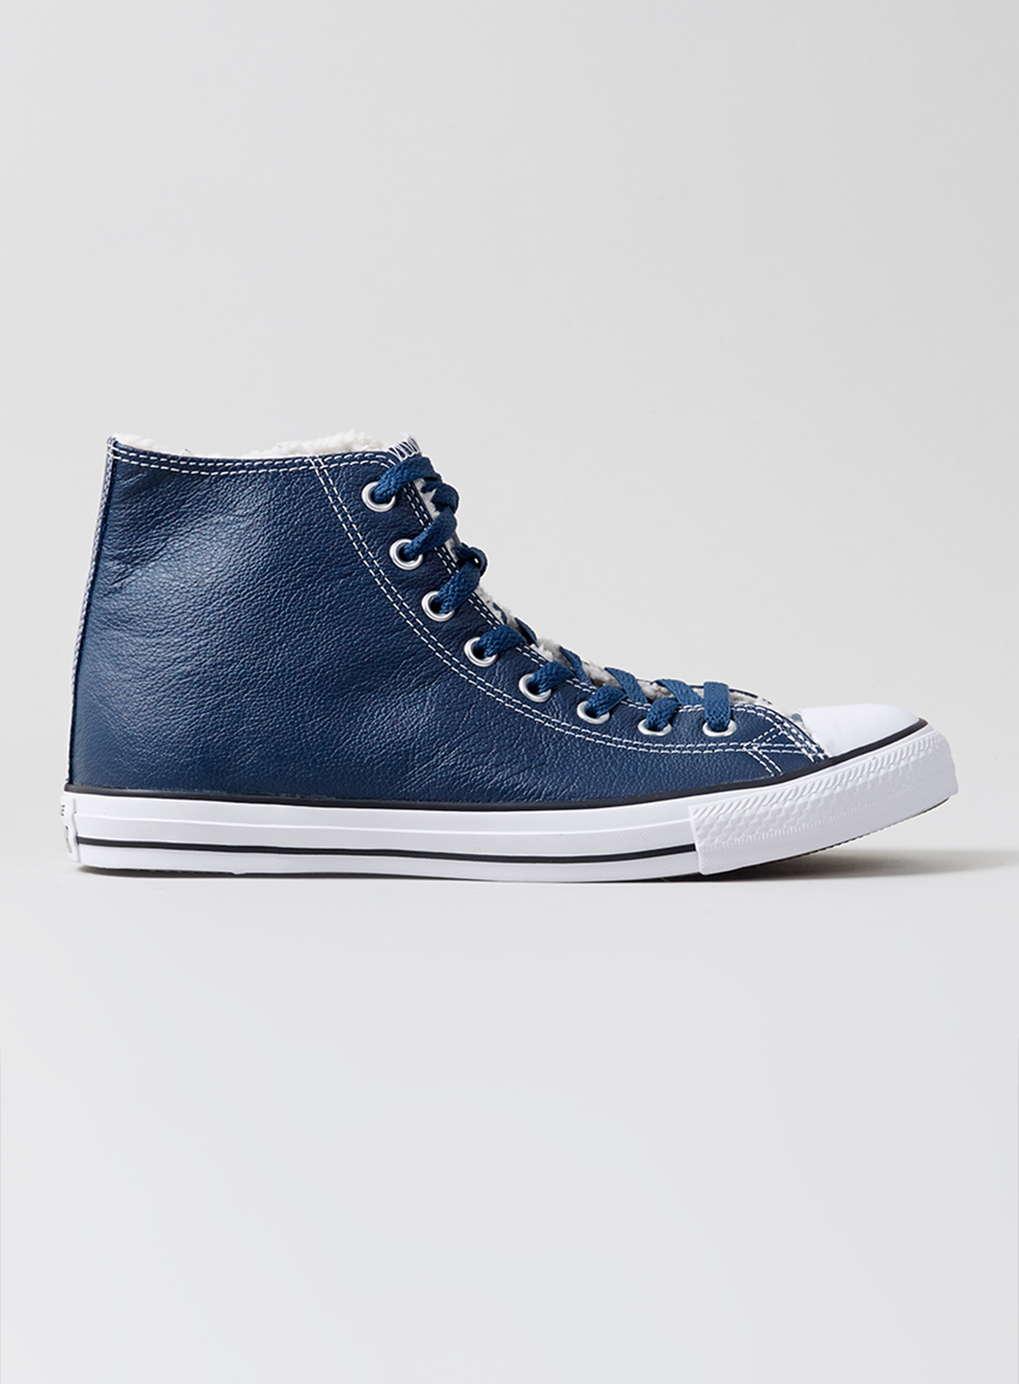 Navy Blue Leather Merrel Shoes